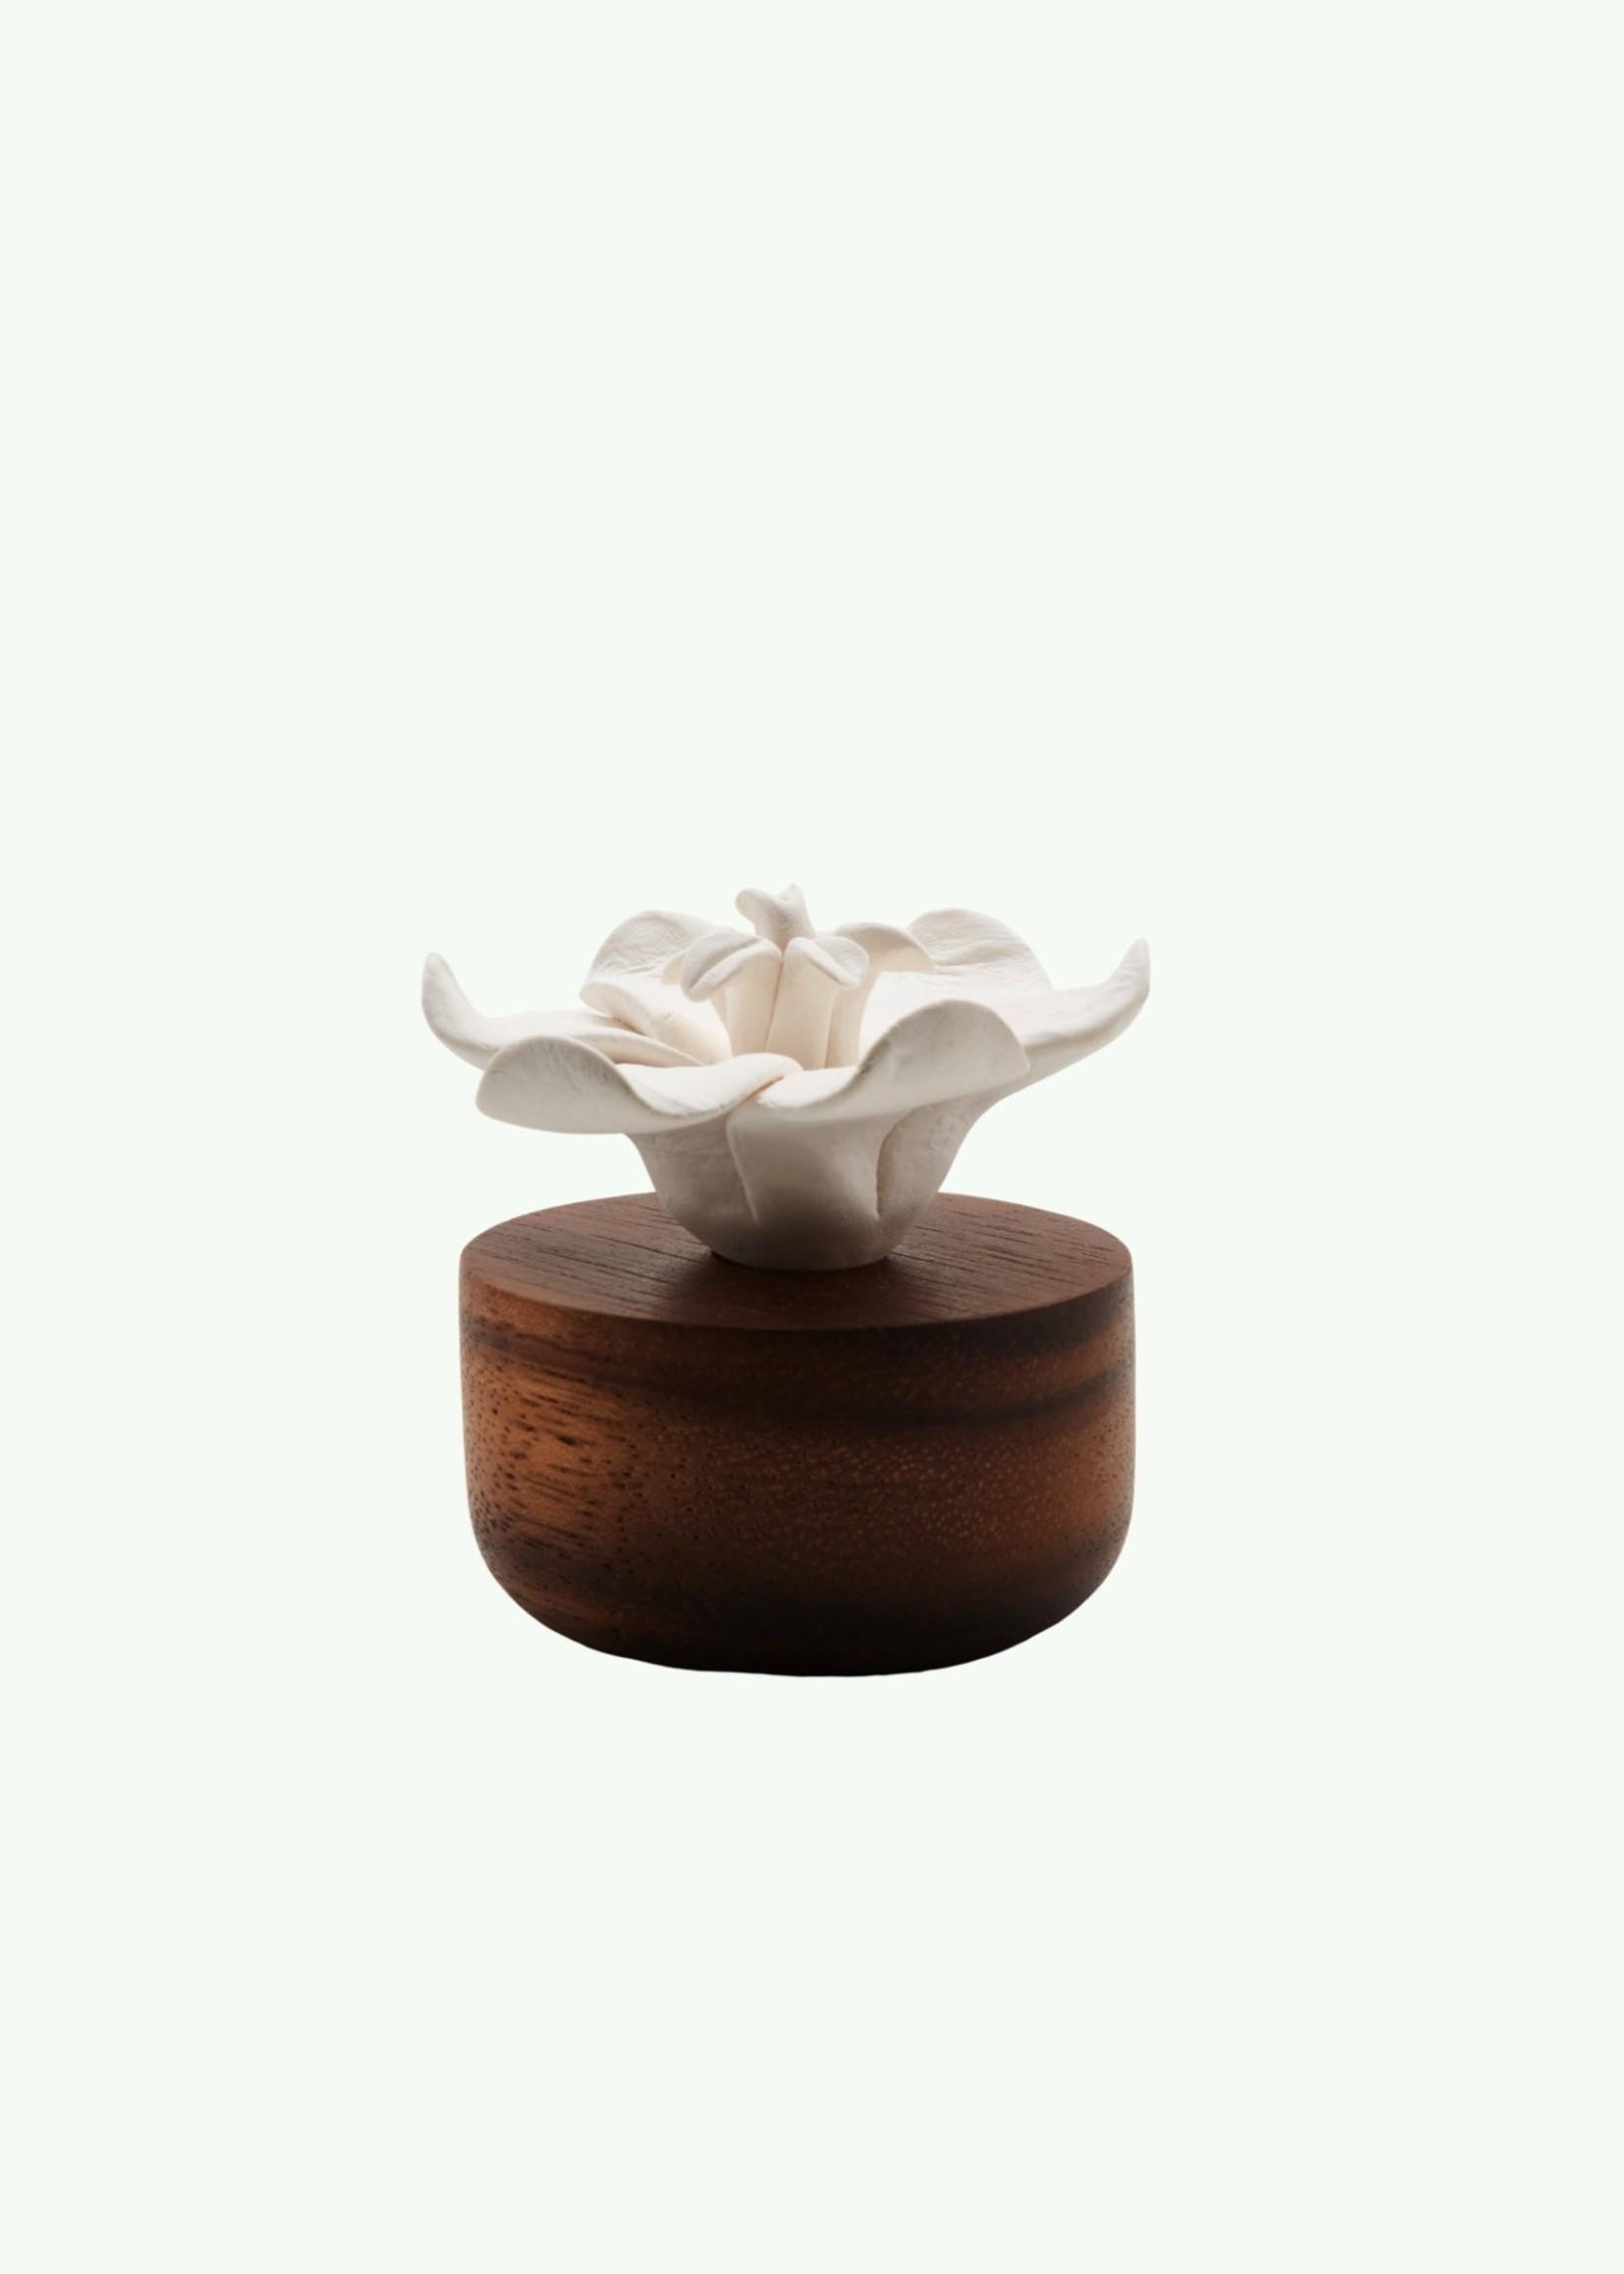 Anoq Anoq - Jasmin d'Orient - Perfume Diffuser - 3 colours